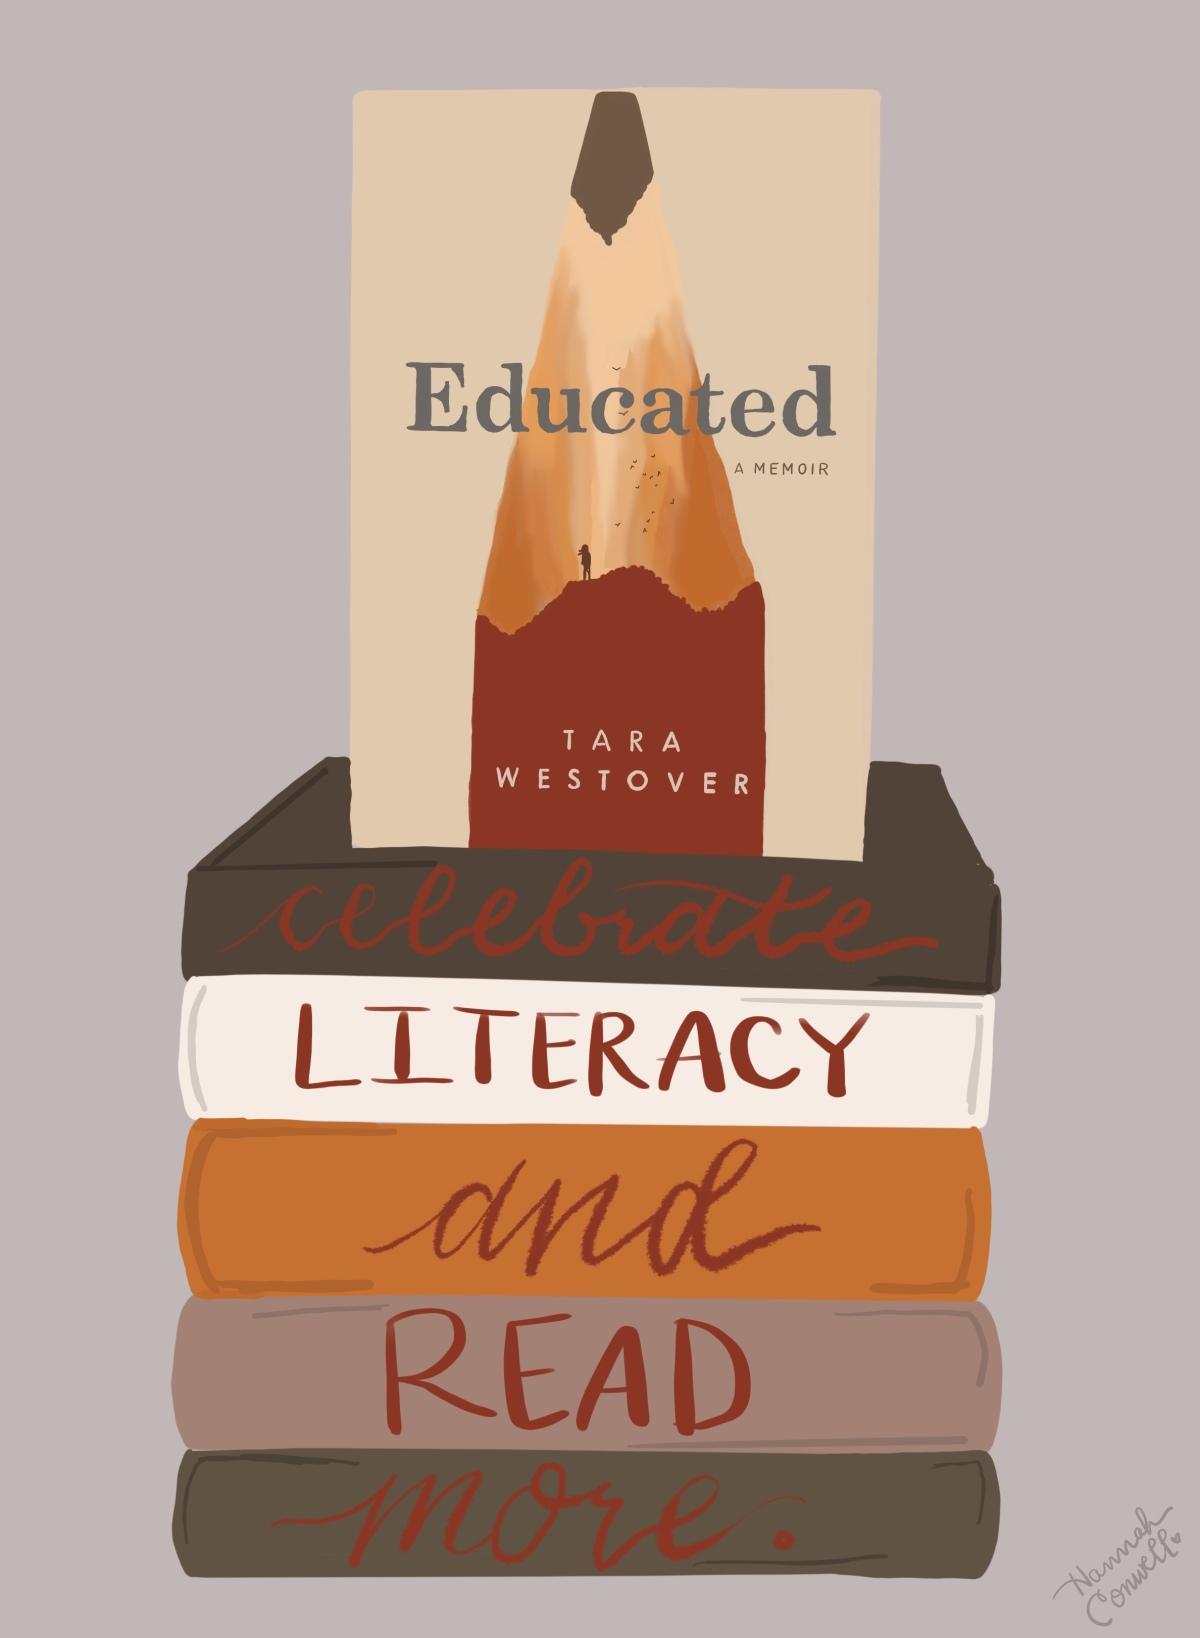 National Literacy Day